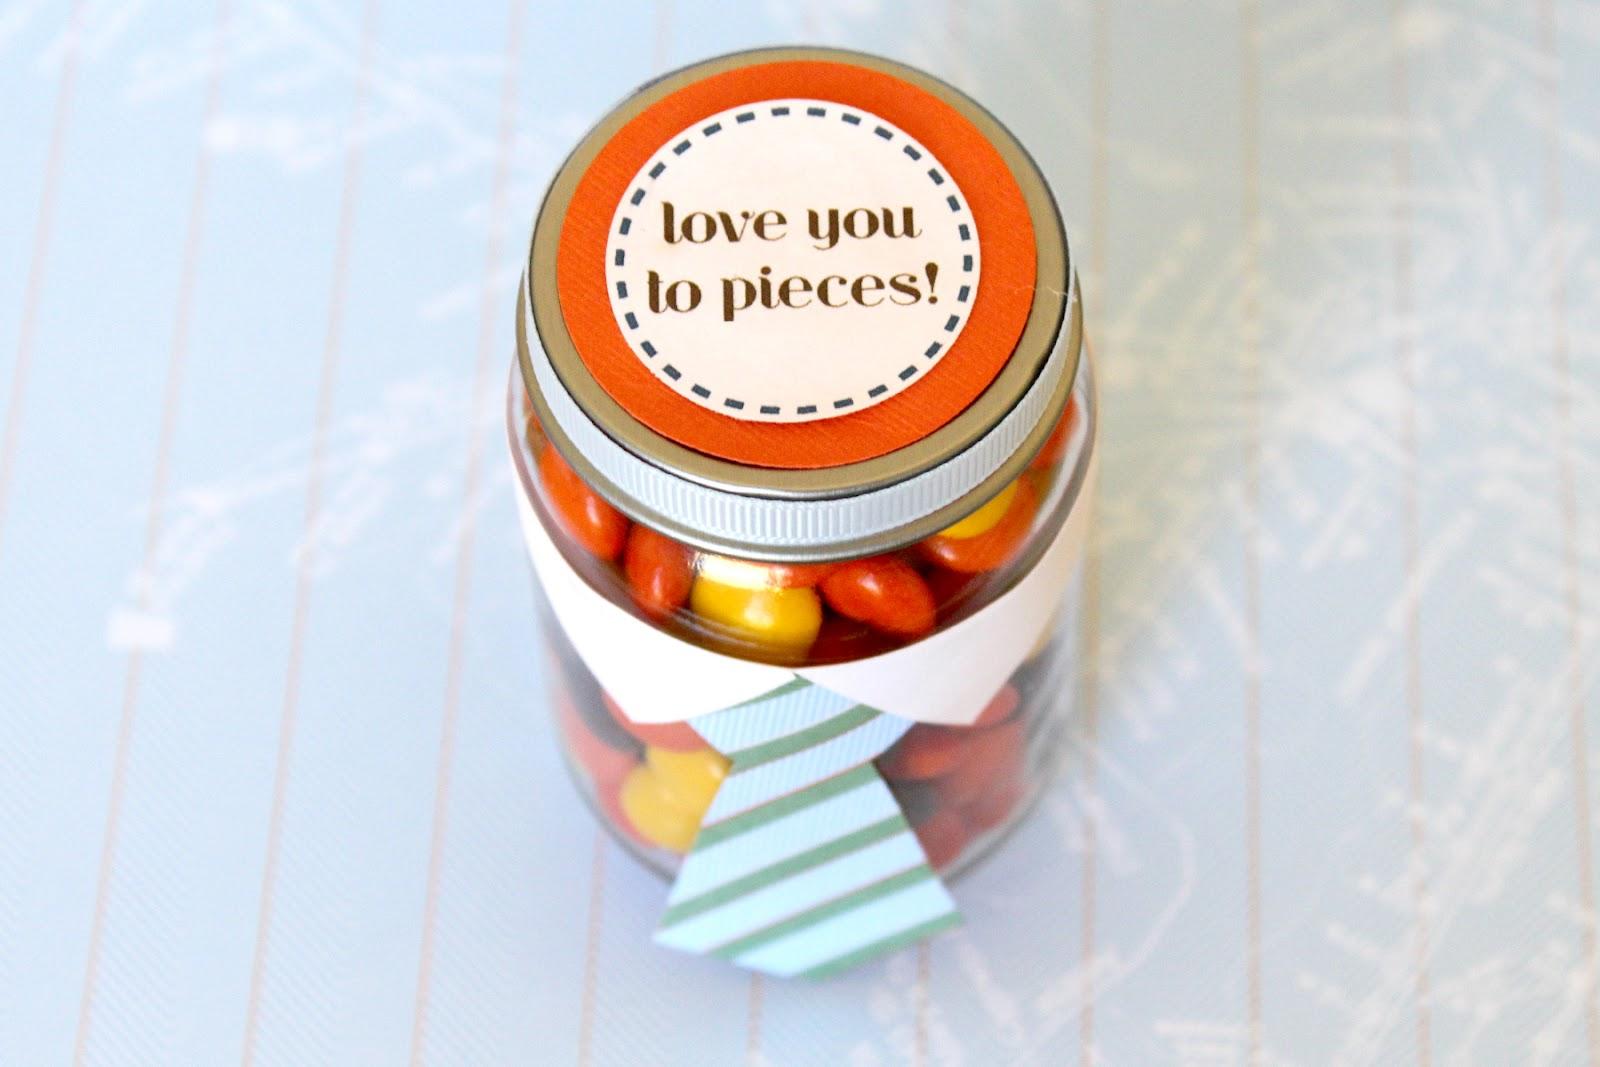 A candy jar gift idea | The Dating Divas